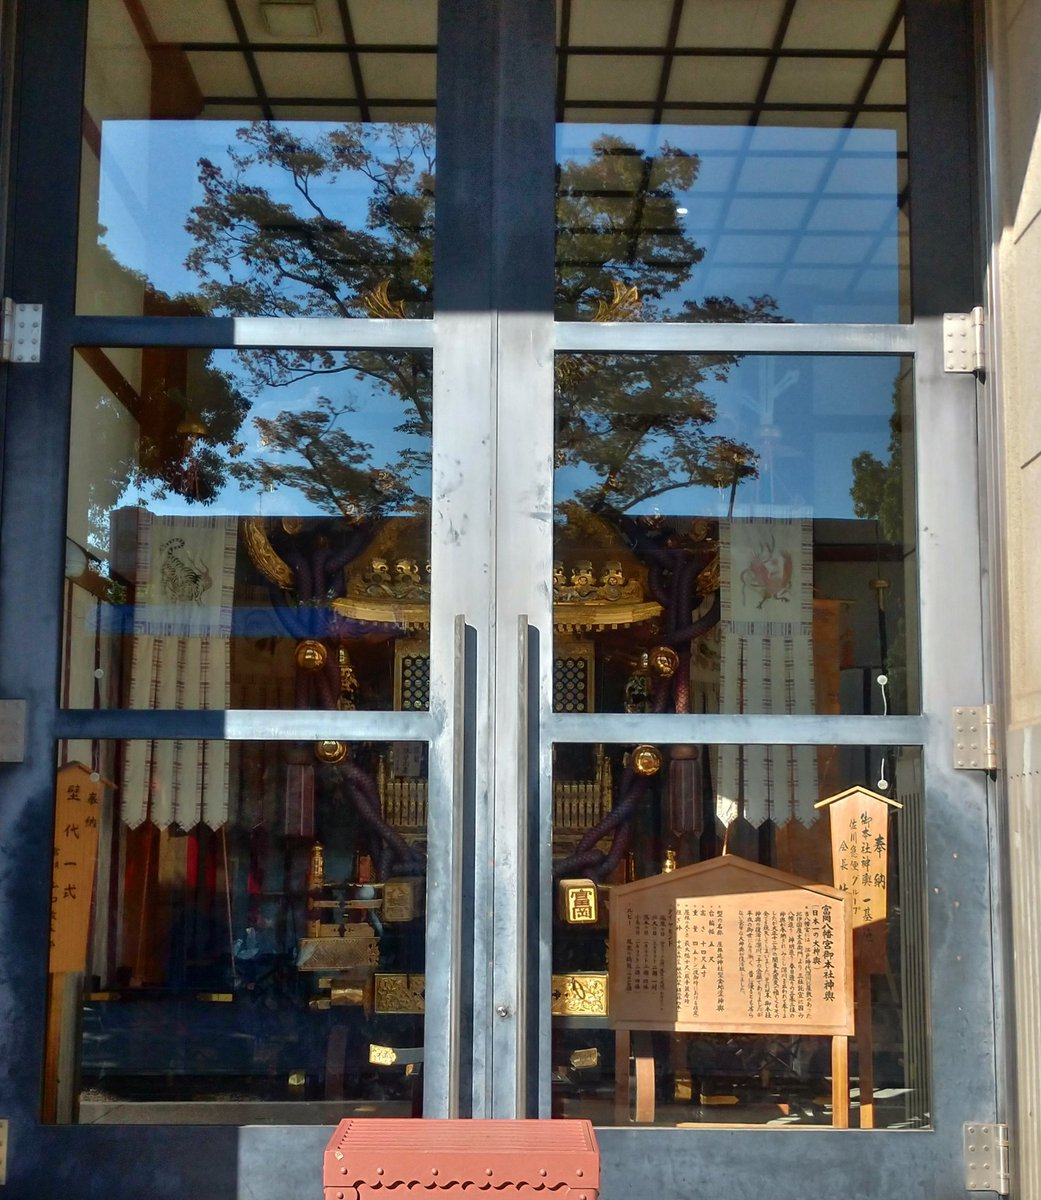 test ツイッターメディア - 181029東京江東区 江戸三大祭の一拠点 #富岡八幡宮 昨年の凄惨な事件の記憶も新しい。 表参道に収まる一の宮御輿は4.5t、多数のダイヤ、ルビーなど宝石を配し大きさ豪華さも日本一を誇ると。 午前中で人もまばらだが喫煙所だけ人だかり🙄勧進相撲発祥の地として歴代横綱の名を刻む横綱力士碑が境内に。 https://t.co/SX1MbIfVTn